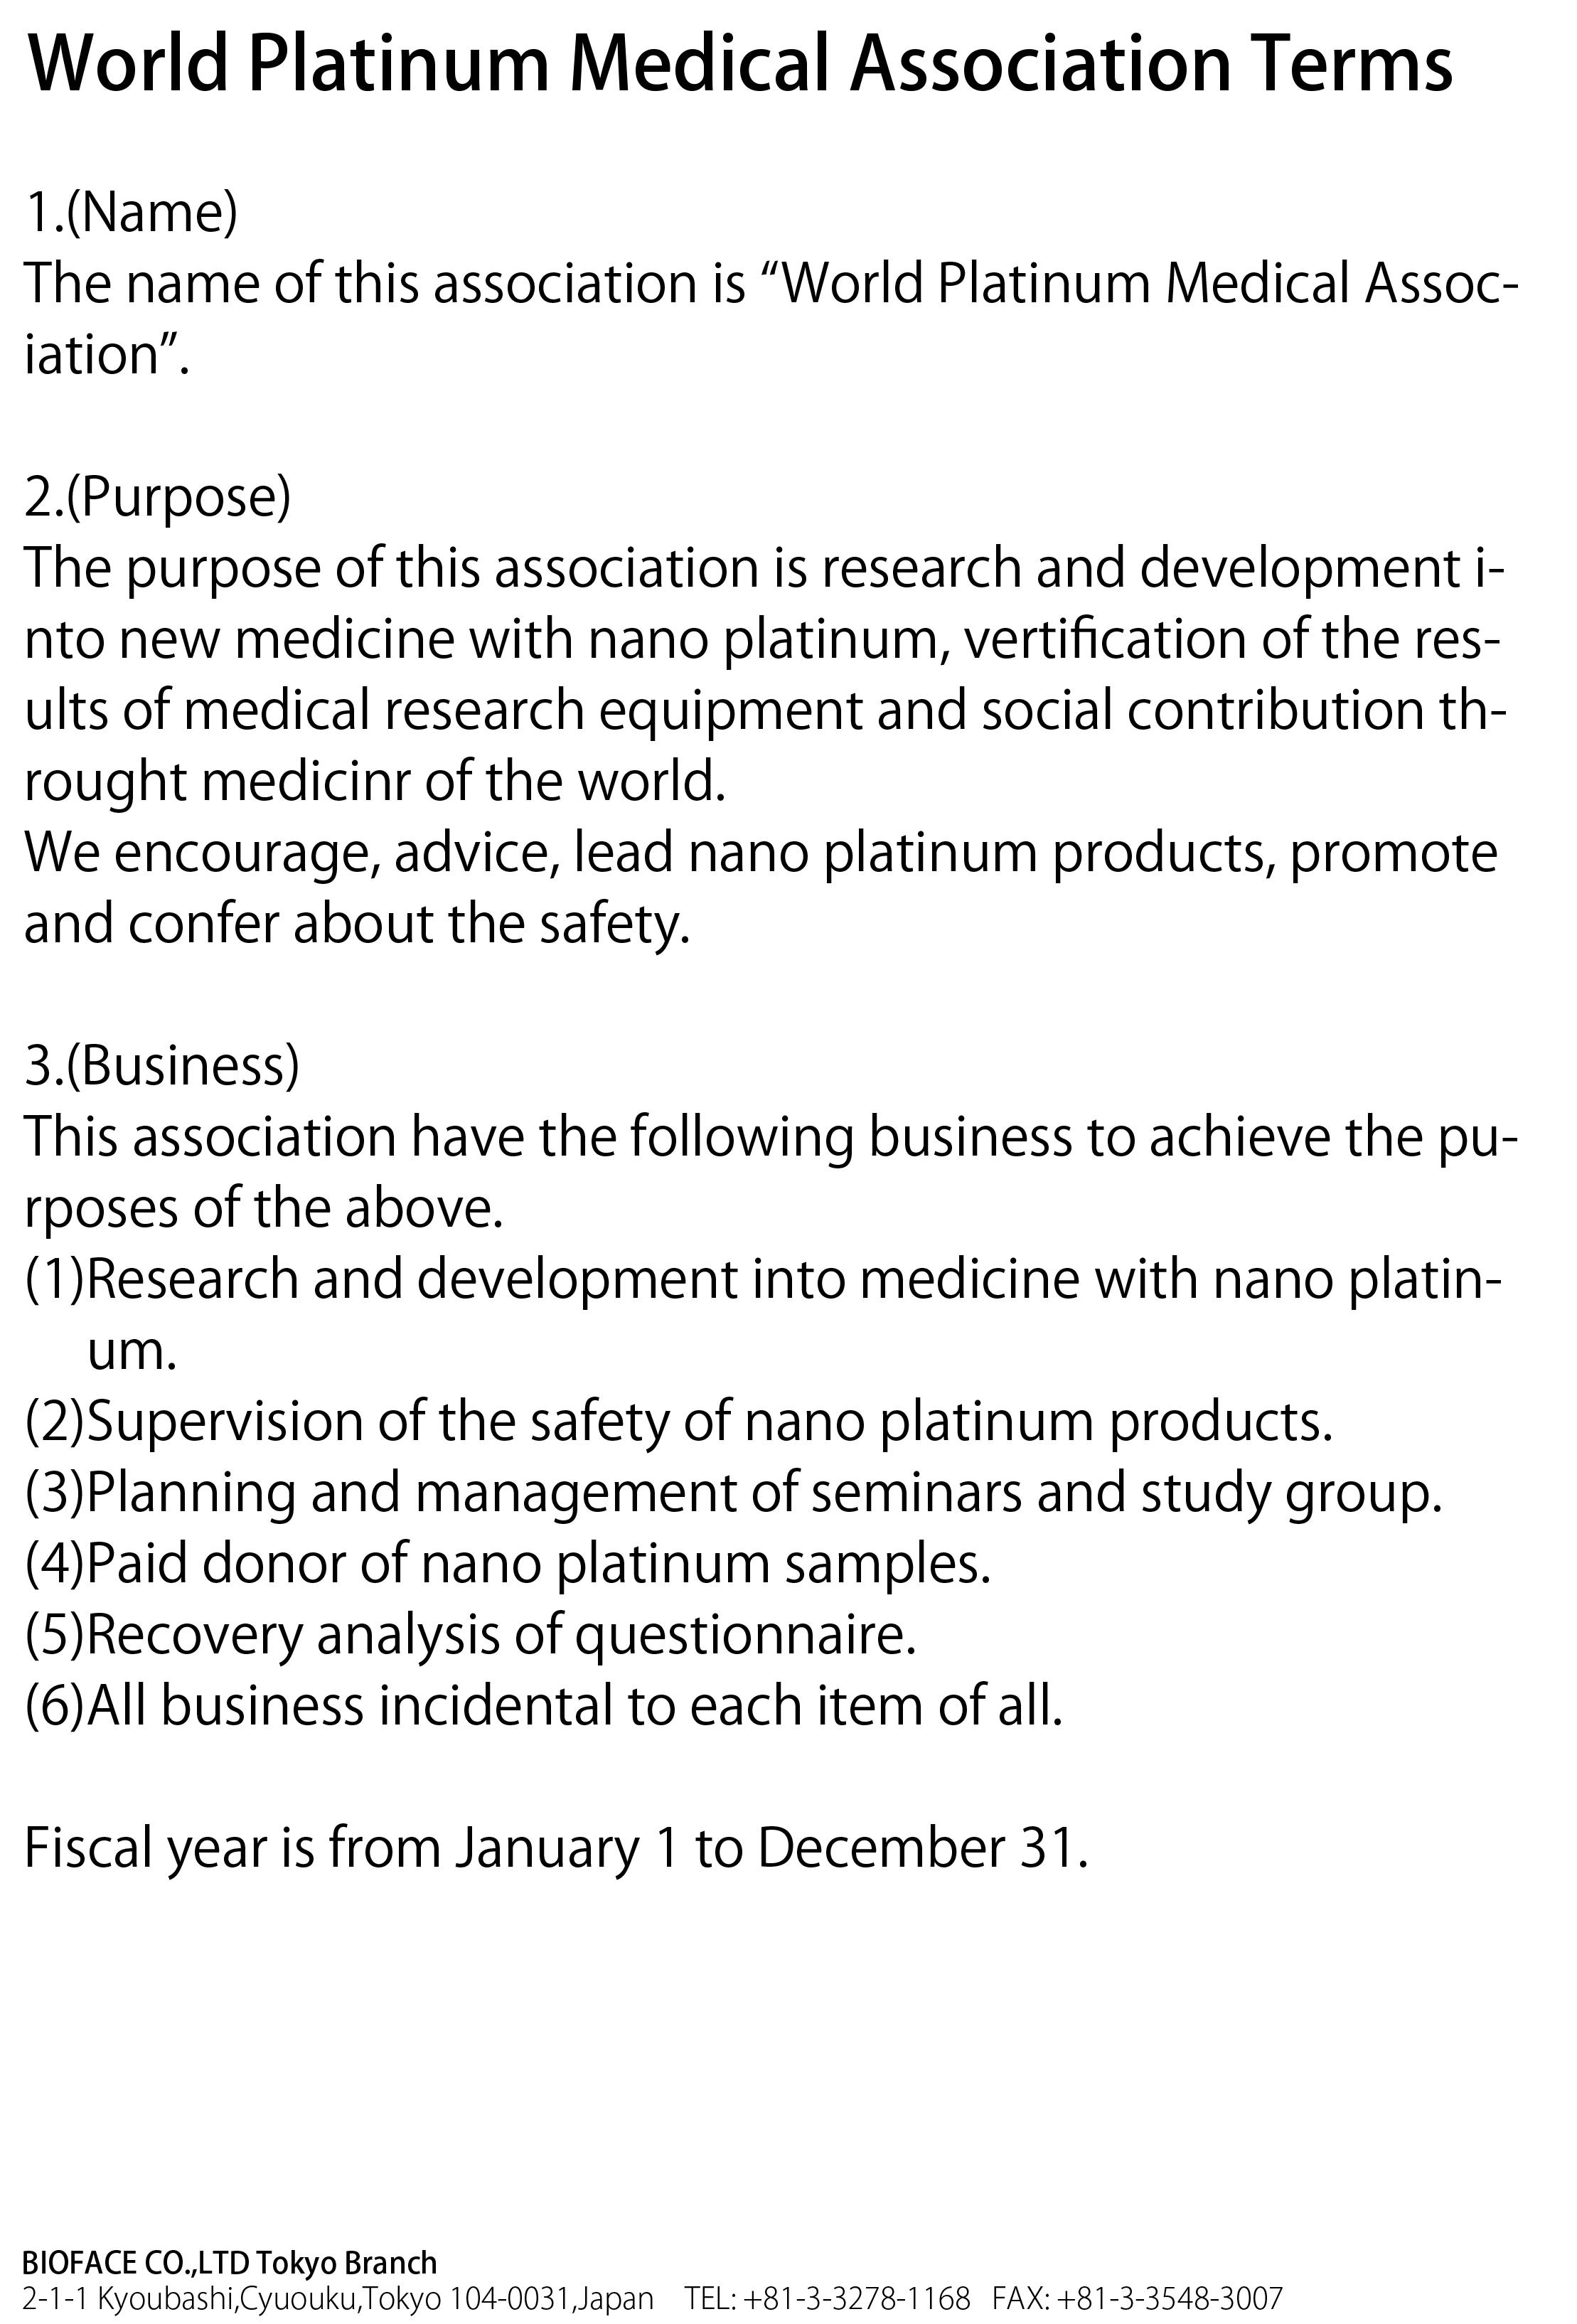 BIOFACE Tokyo Laboratory / World Platinum Medical Association